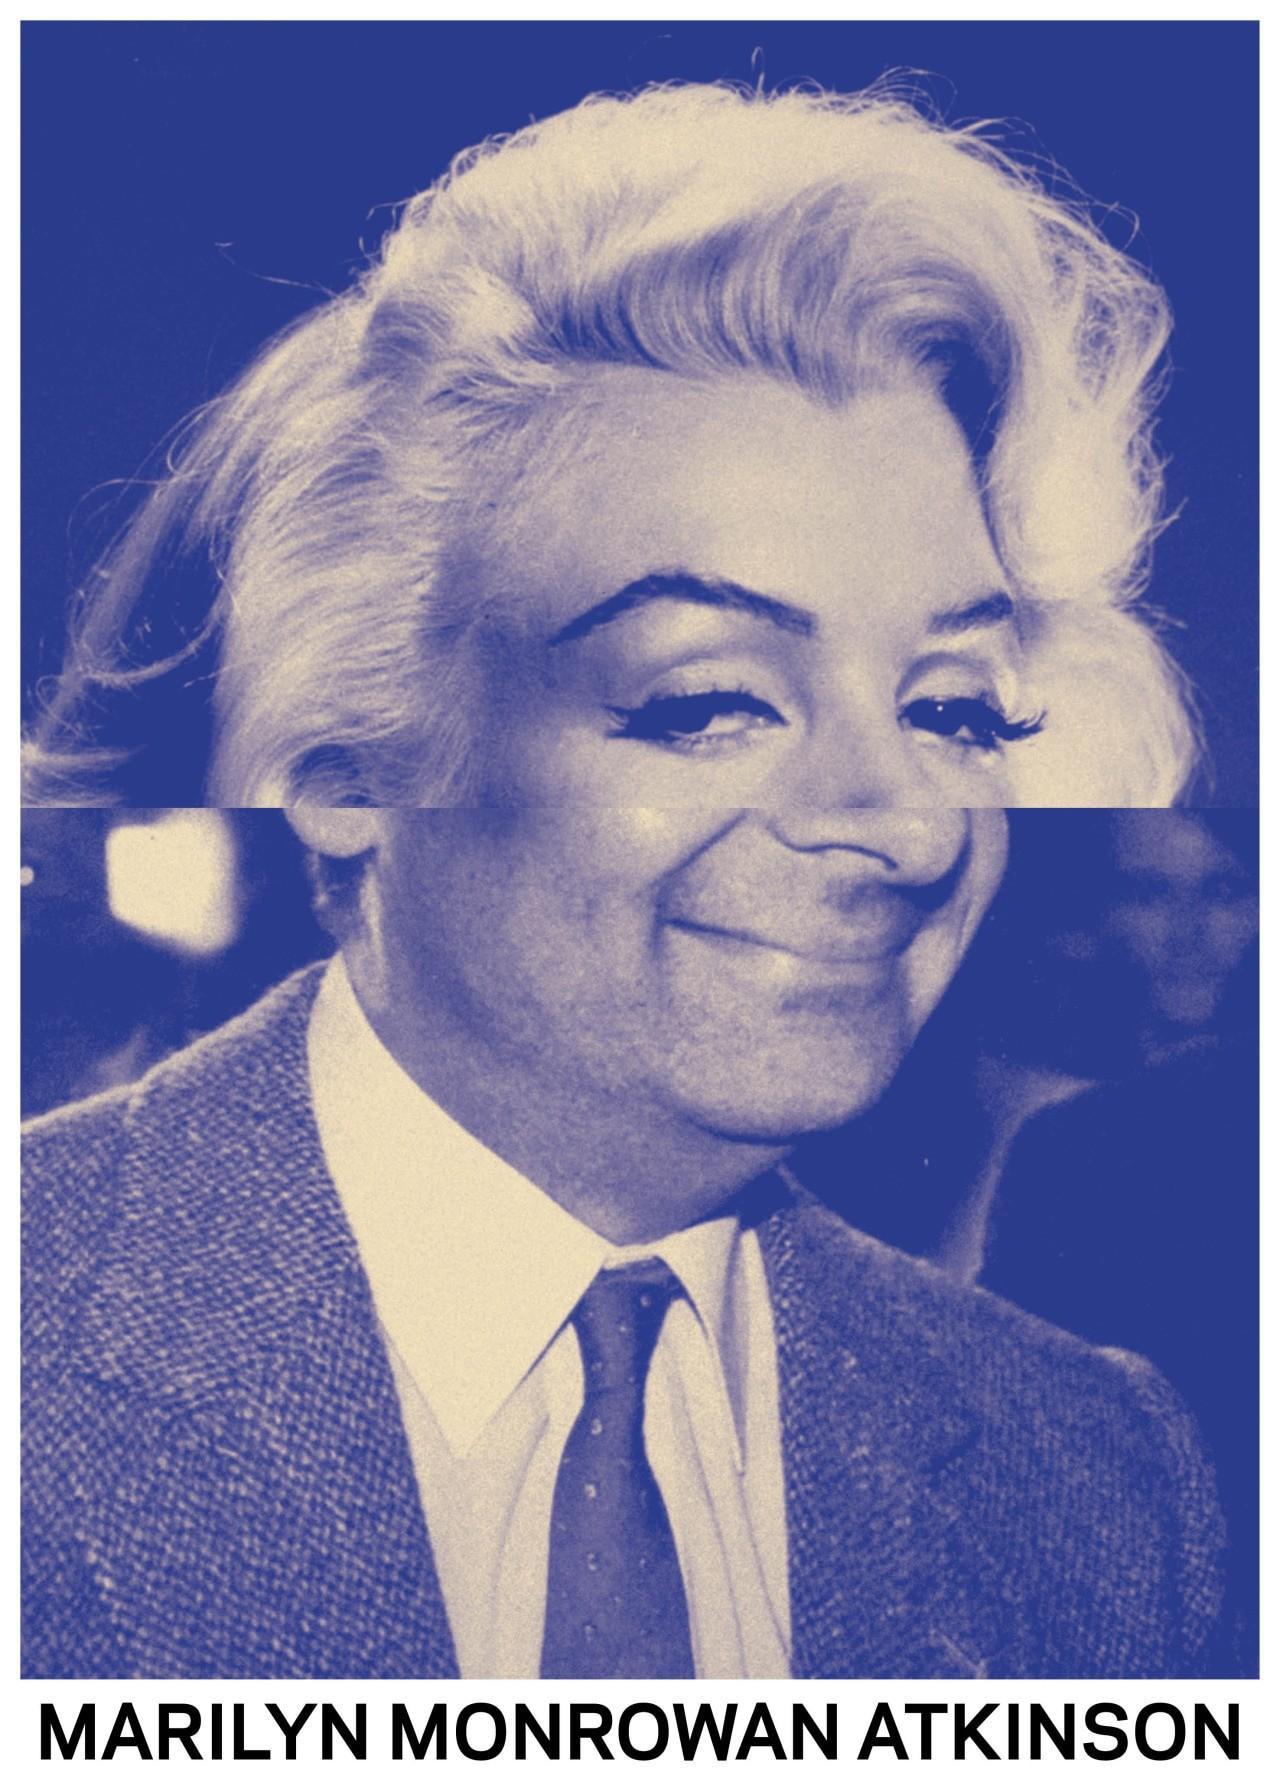 Marilyn-monrowan-atkinson-min